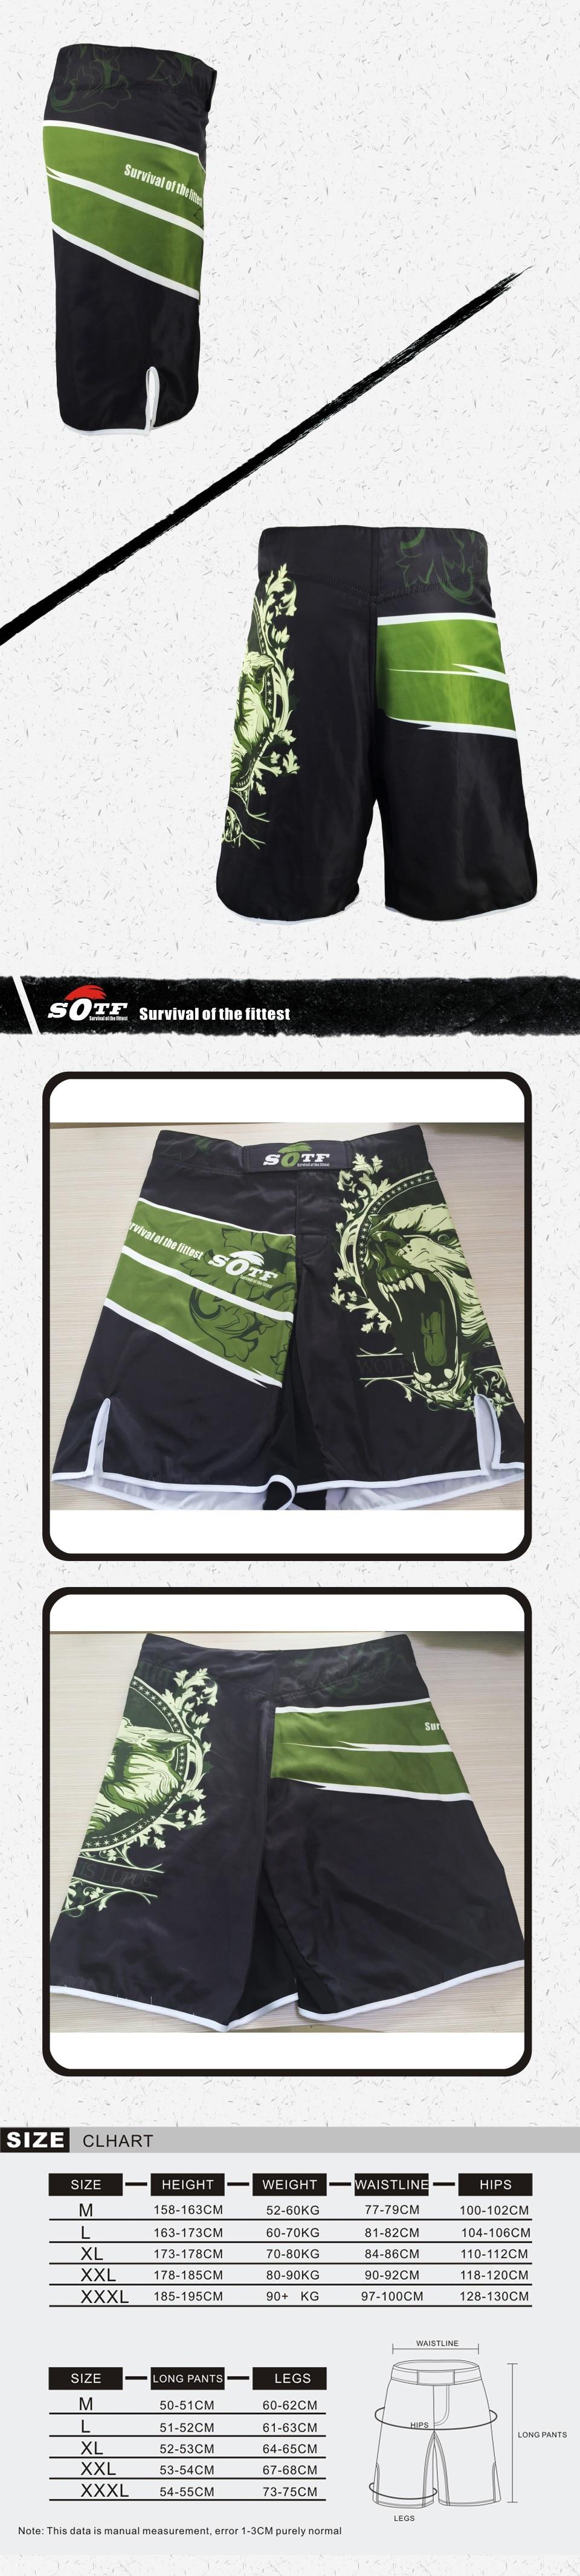 SOTF Green Bear breathable cotton boxer shorts mma sports training thai boxing